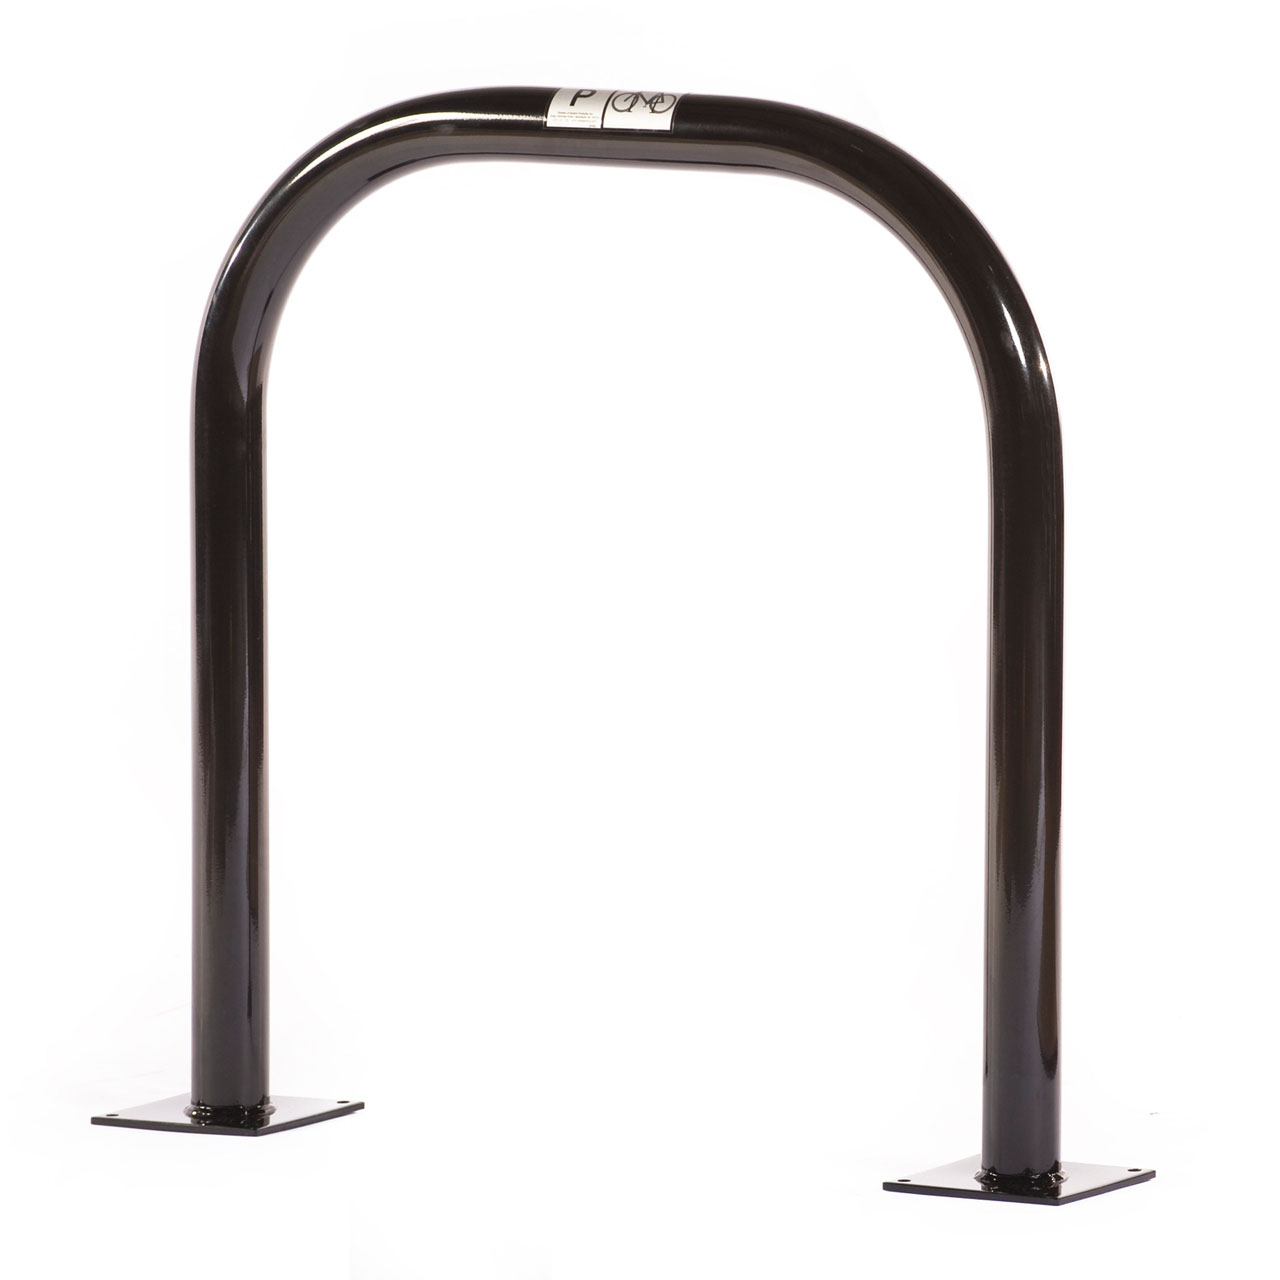 Double Bend Inverted U Bike Dock